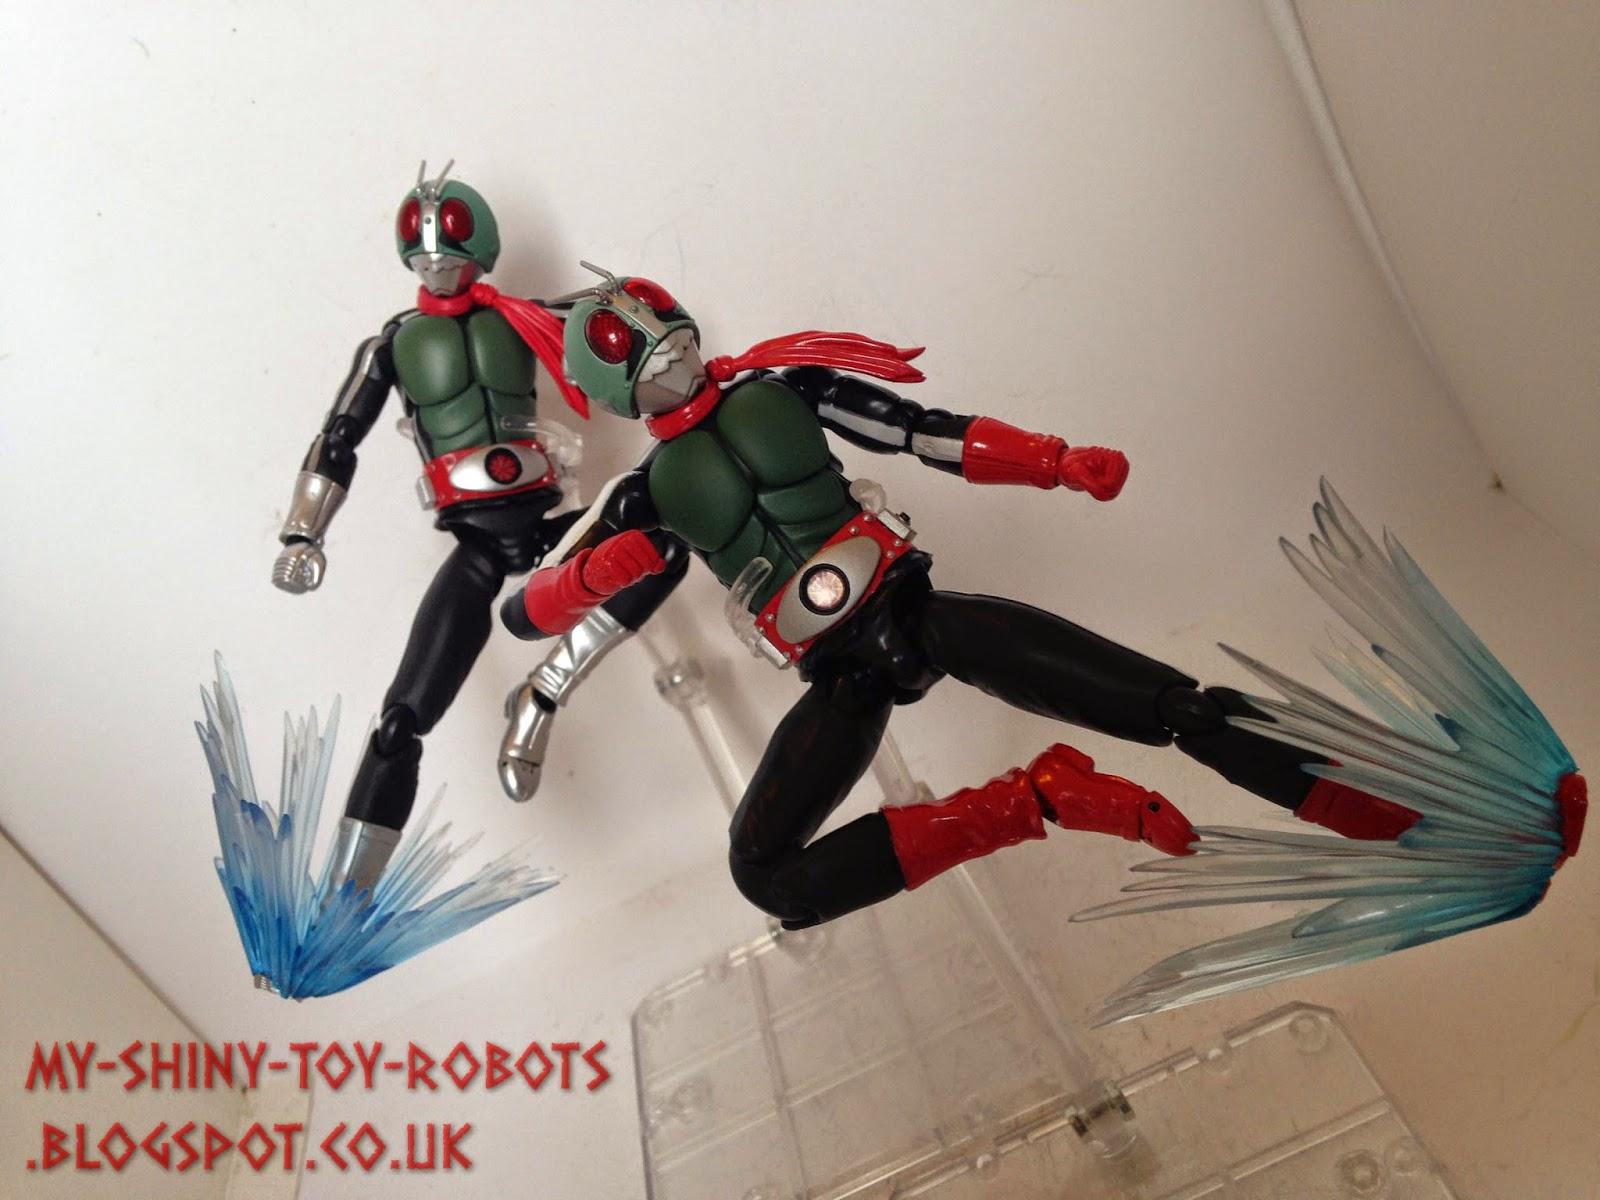 Double Rider kick!